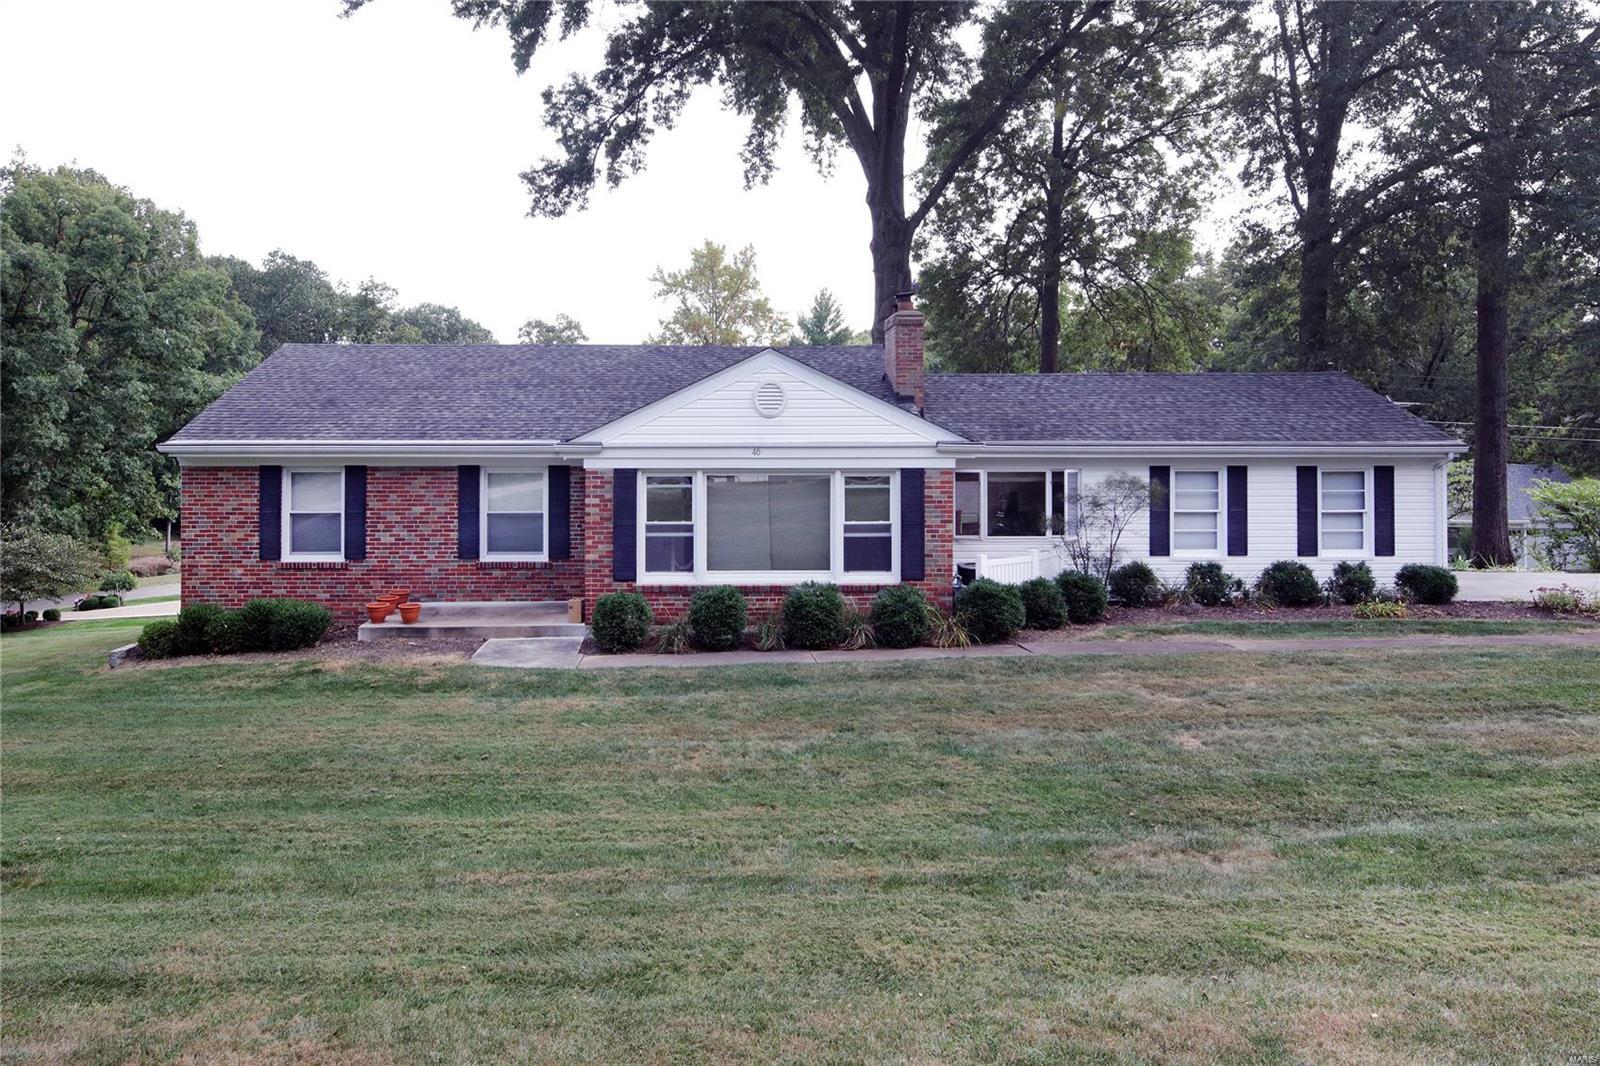 46 Tealwood Drive Property Photo - Creve Coeur, MO real estate listing